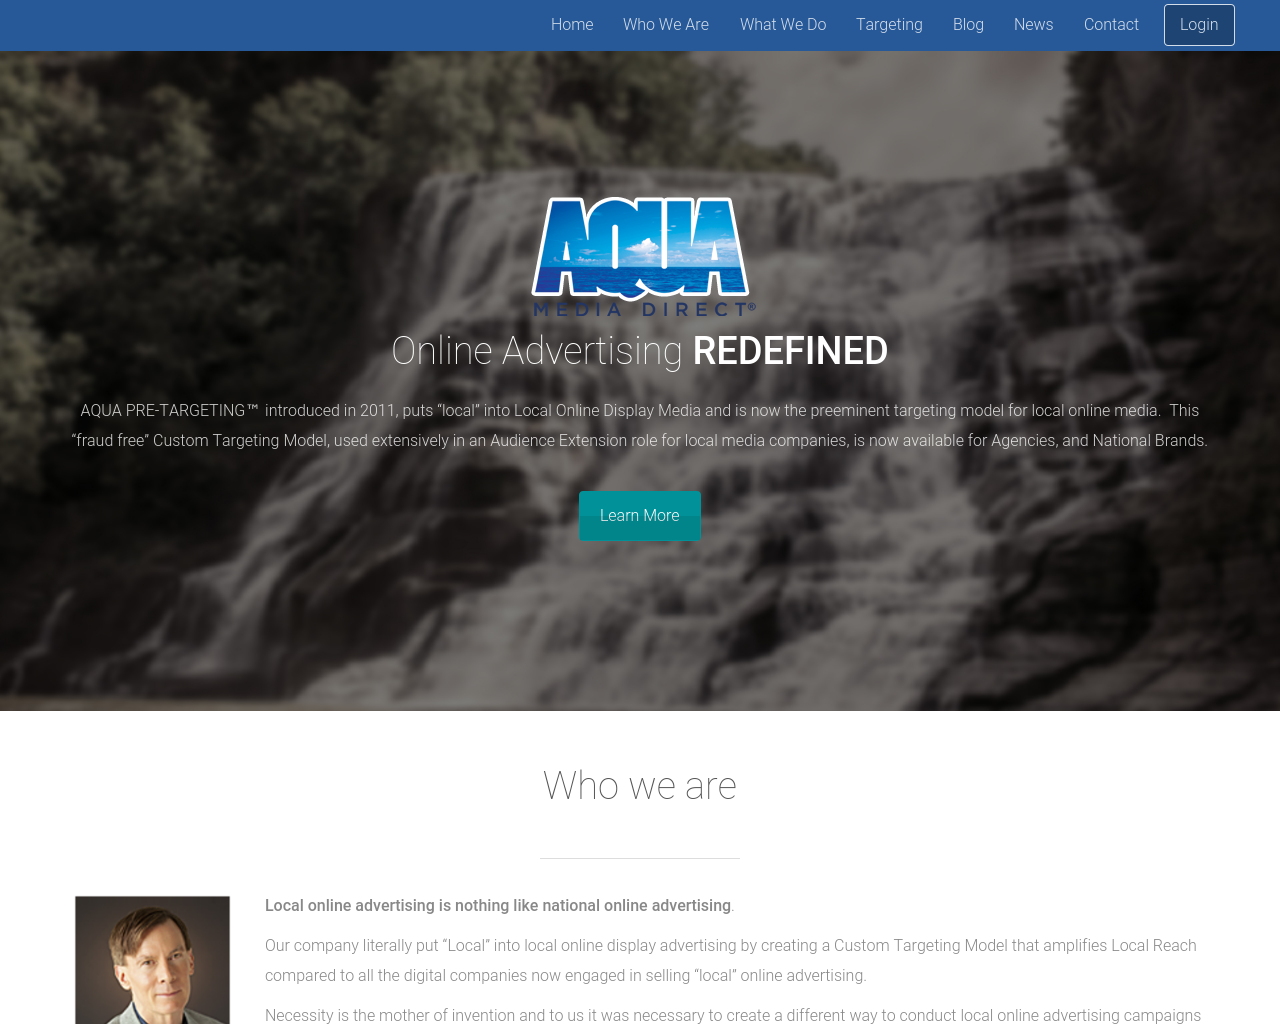 Aqua-Media-Direct-Advertising-Reviews-Pricing